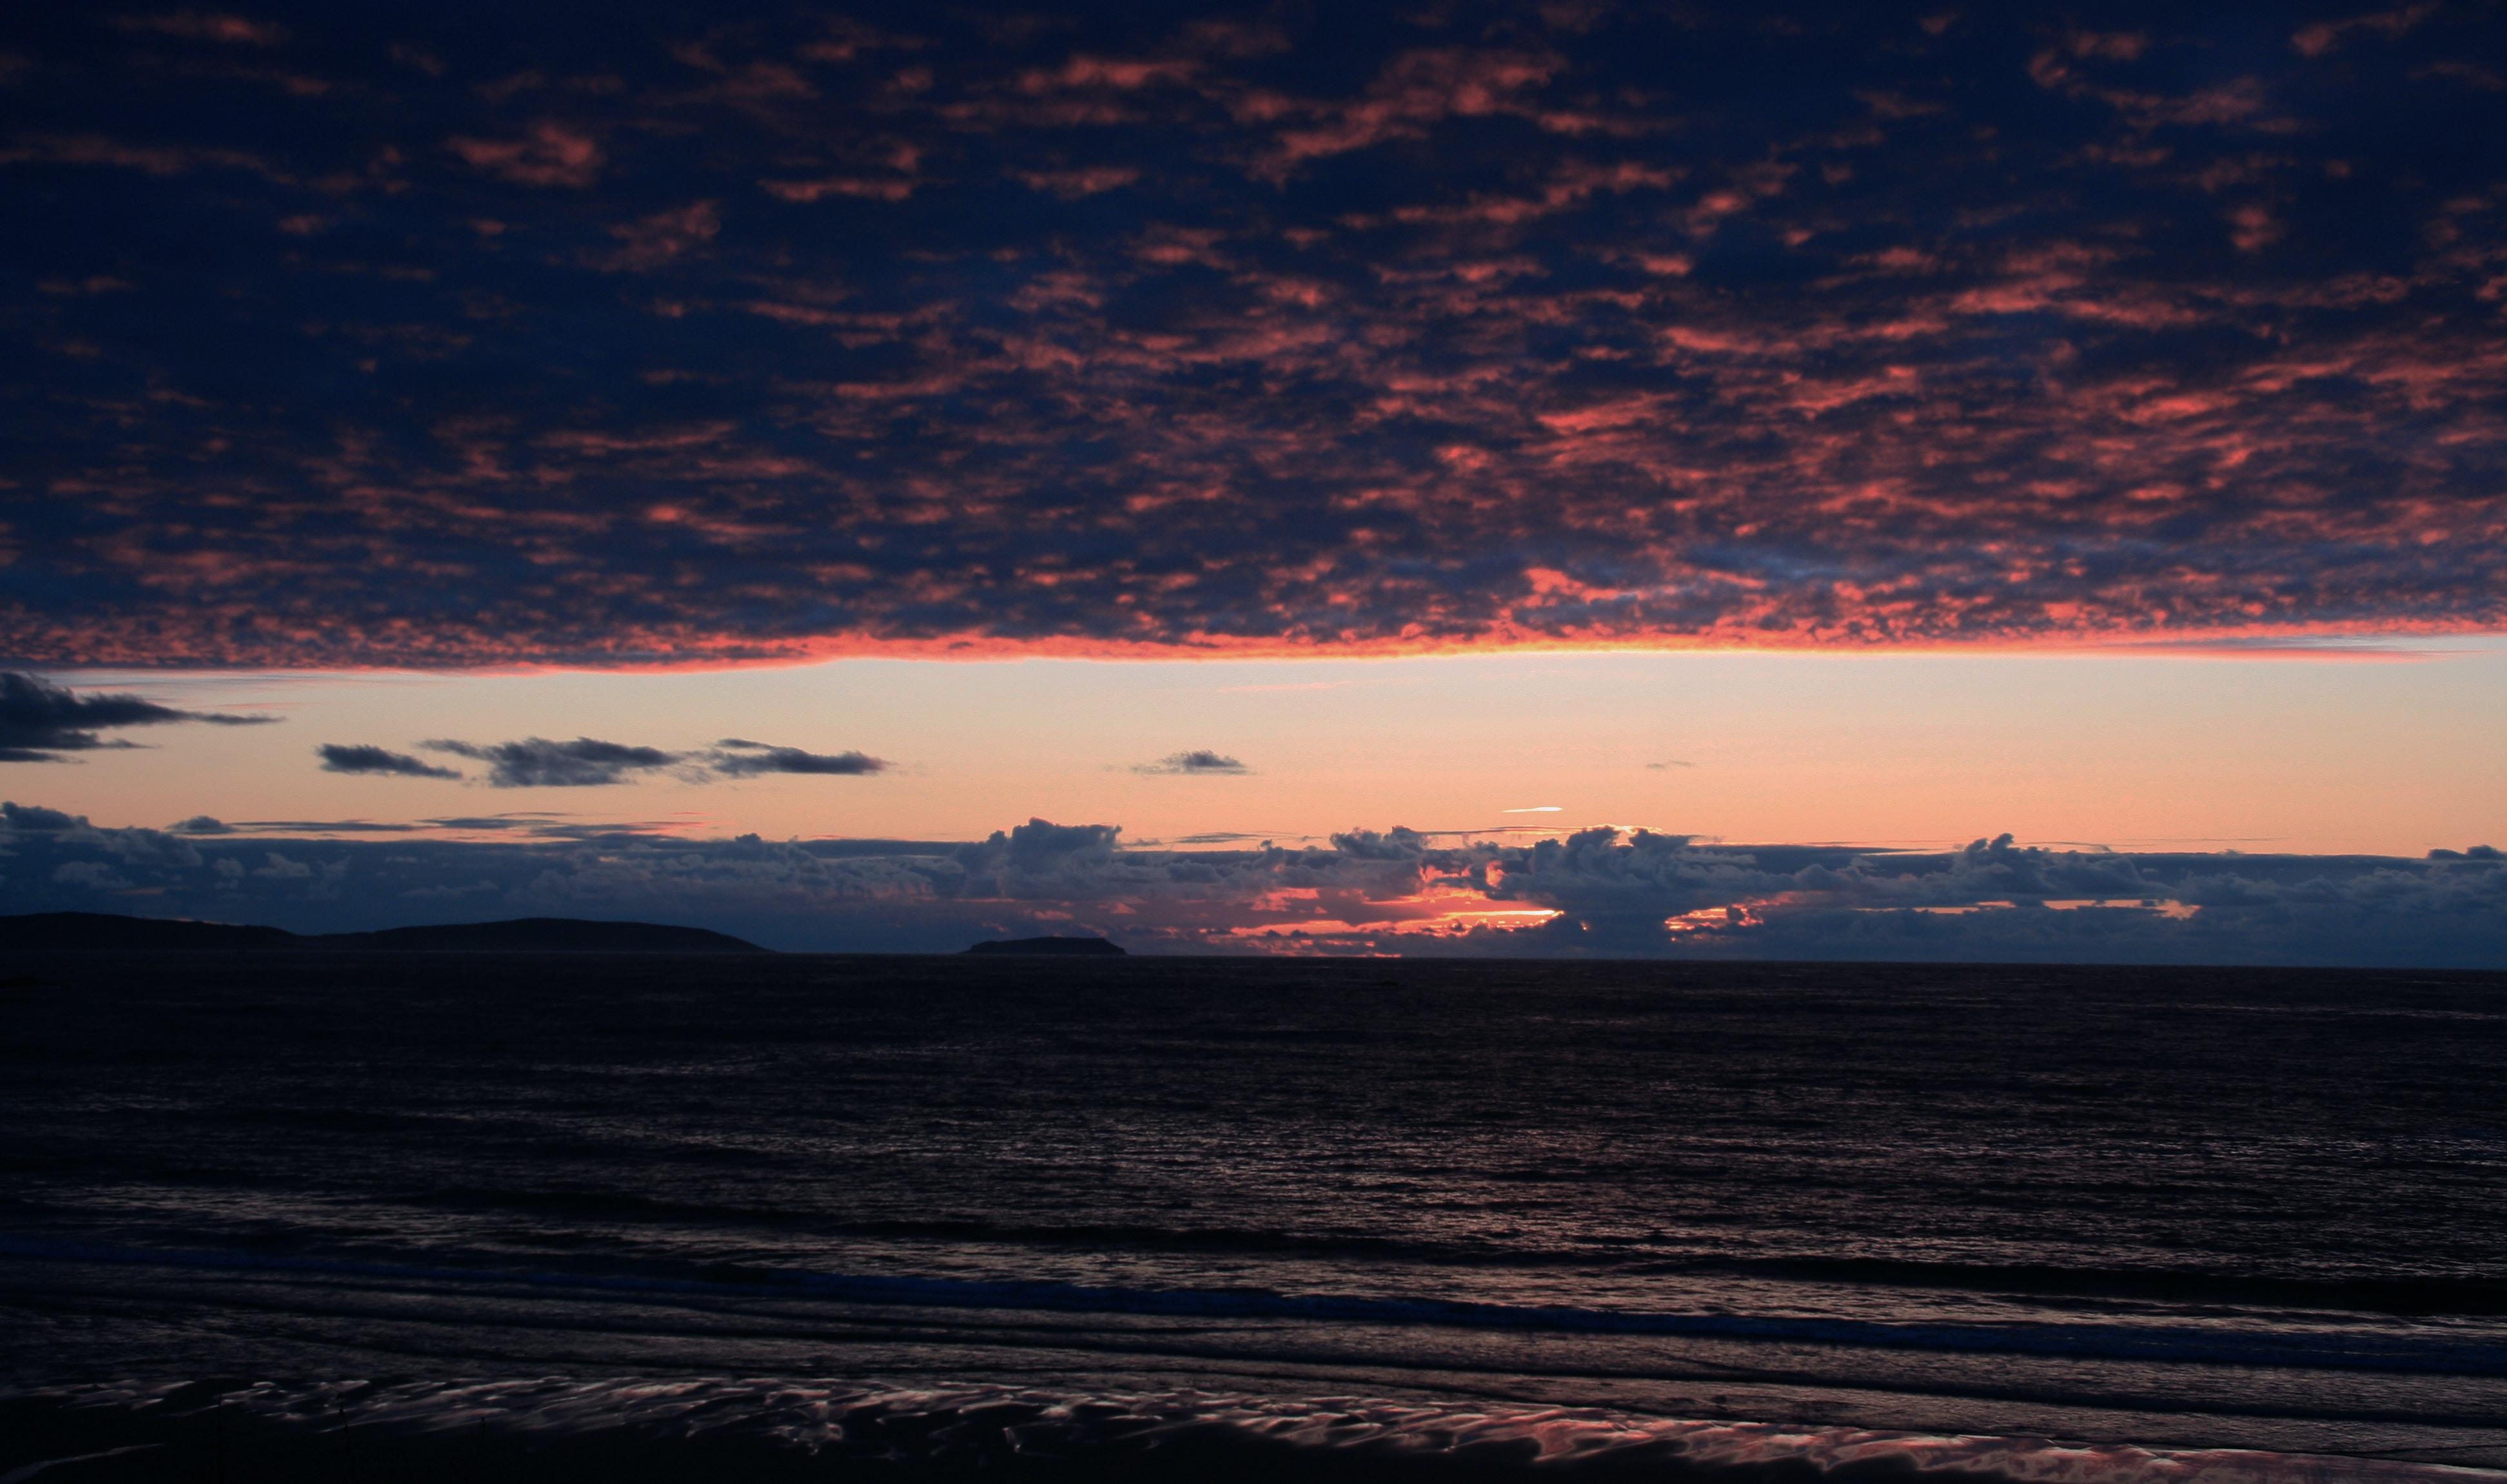 A purple cloud covered sky above a beach.